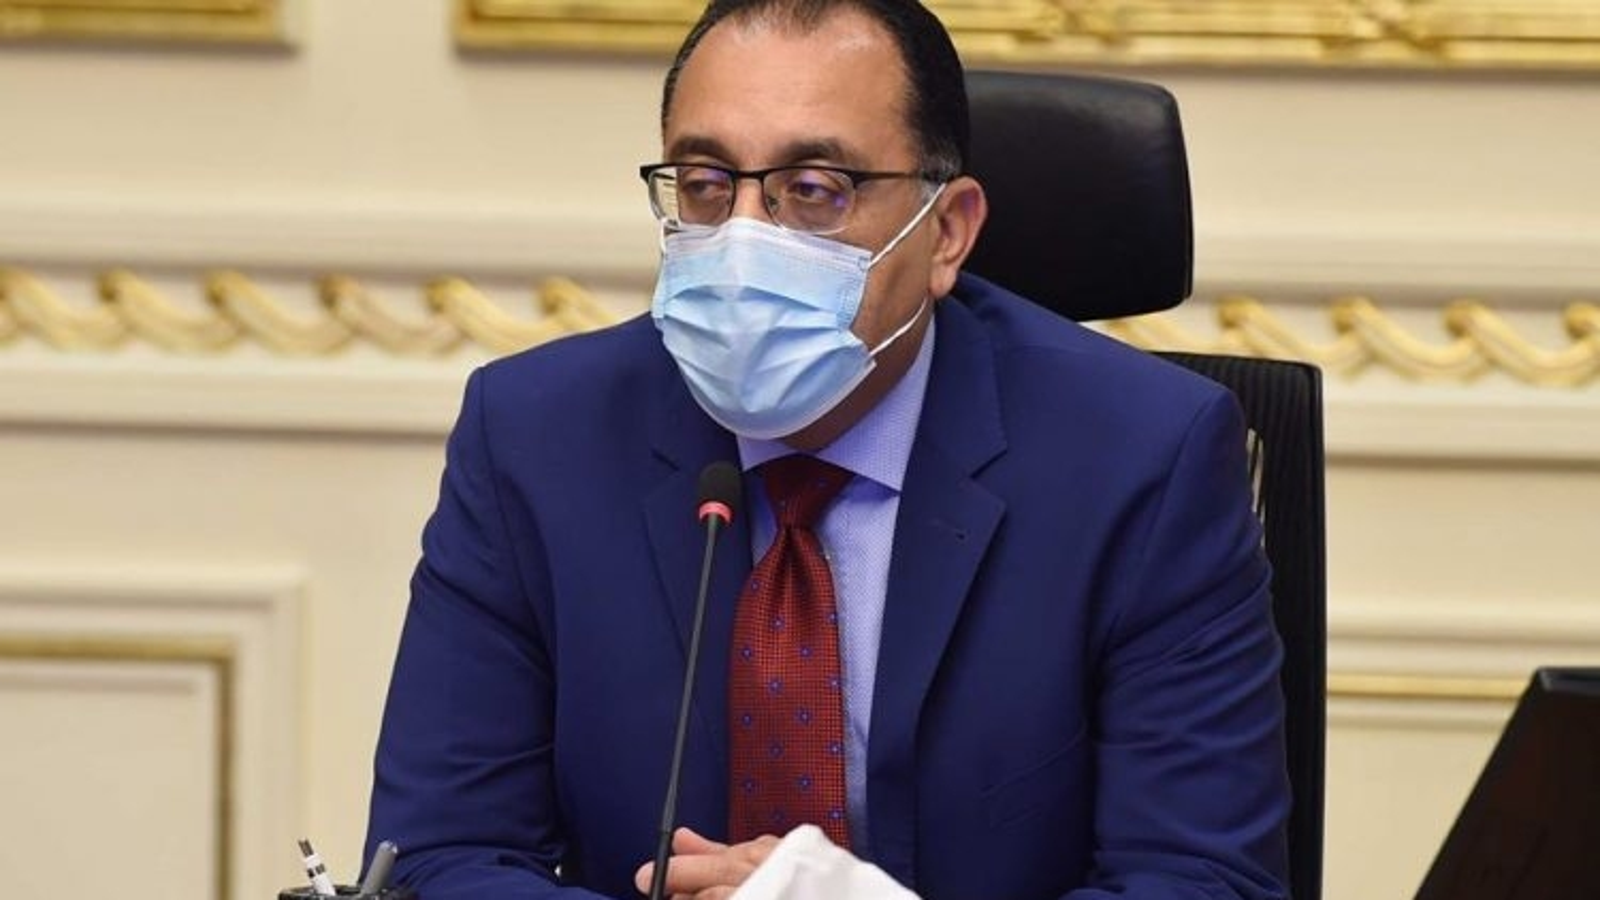 Ai Cập thắt chặt kiểm soát dịp lễ Hồi giáo Eid al-Fitr để ngăn Covid-19 lây lan